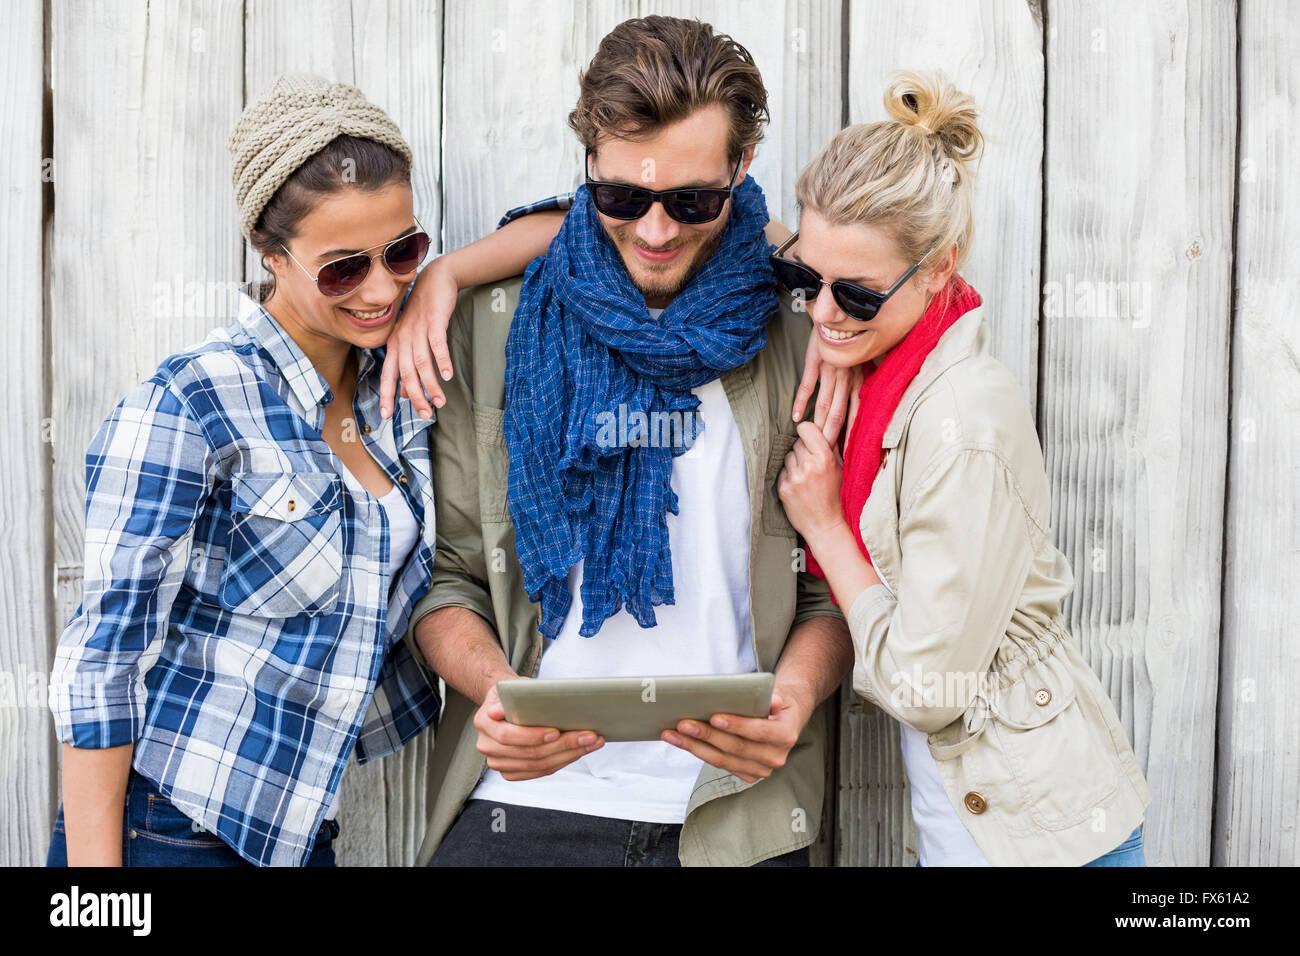 Friends using digital tablet - Stock Image